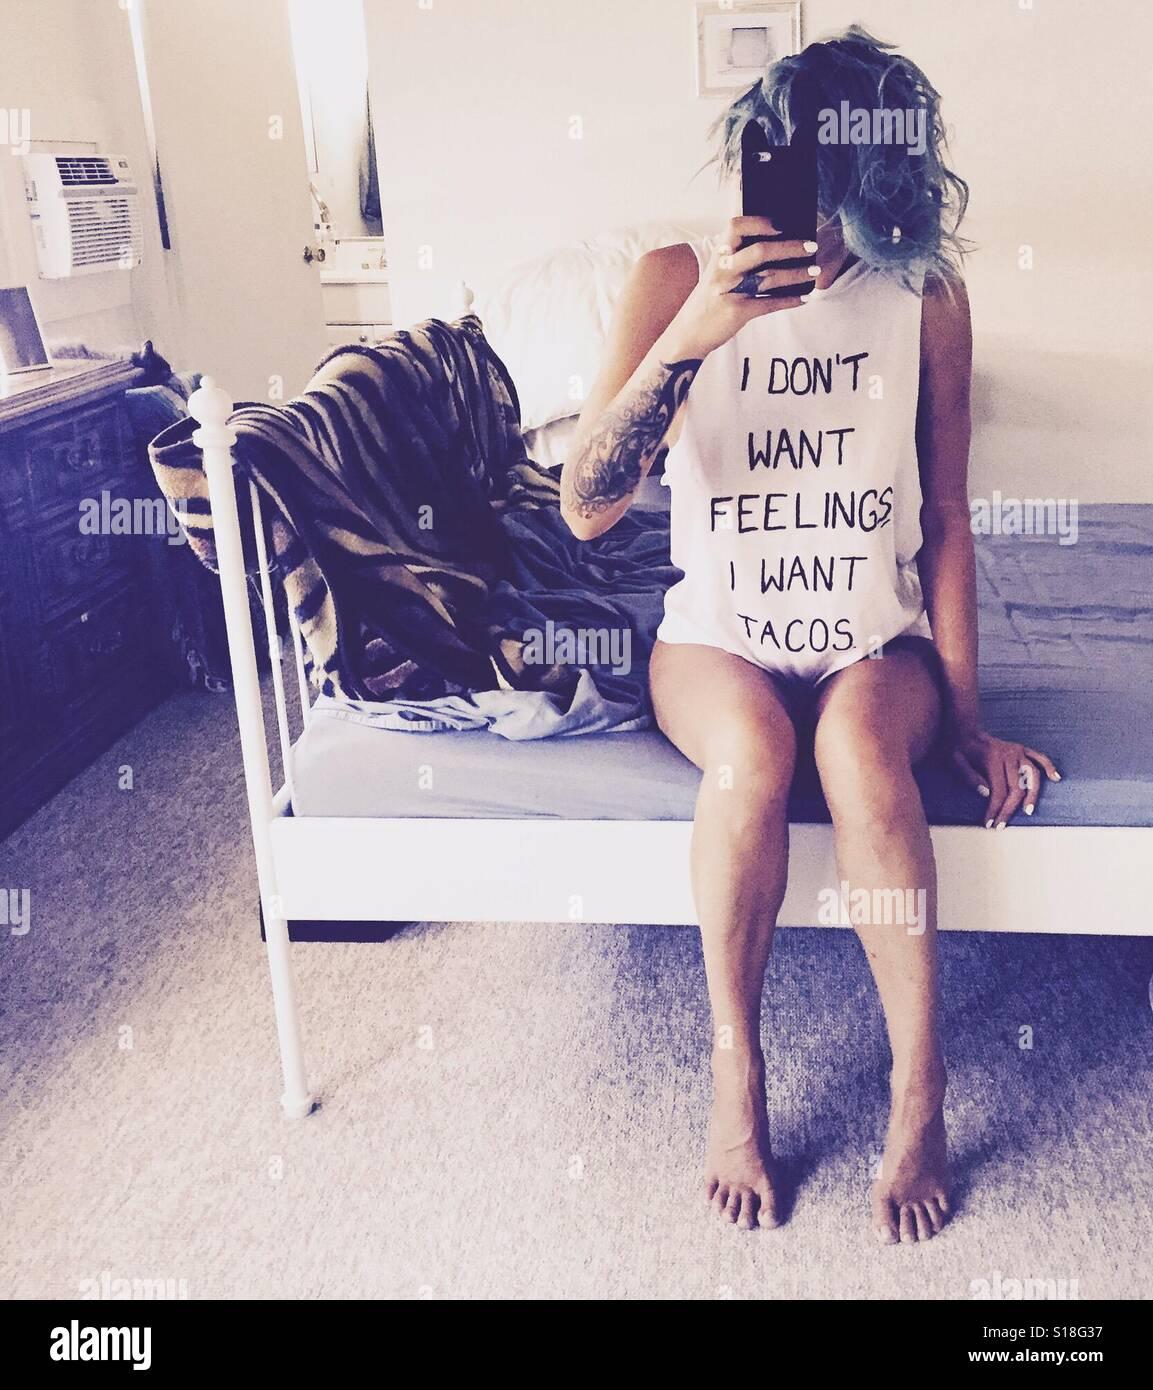 Feelings. Stock Photo